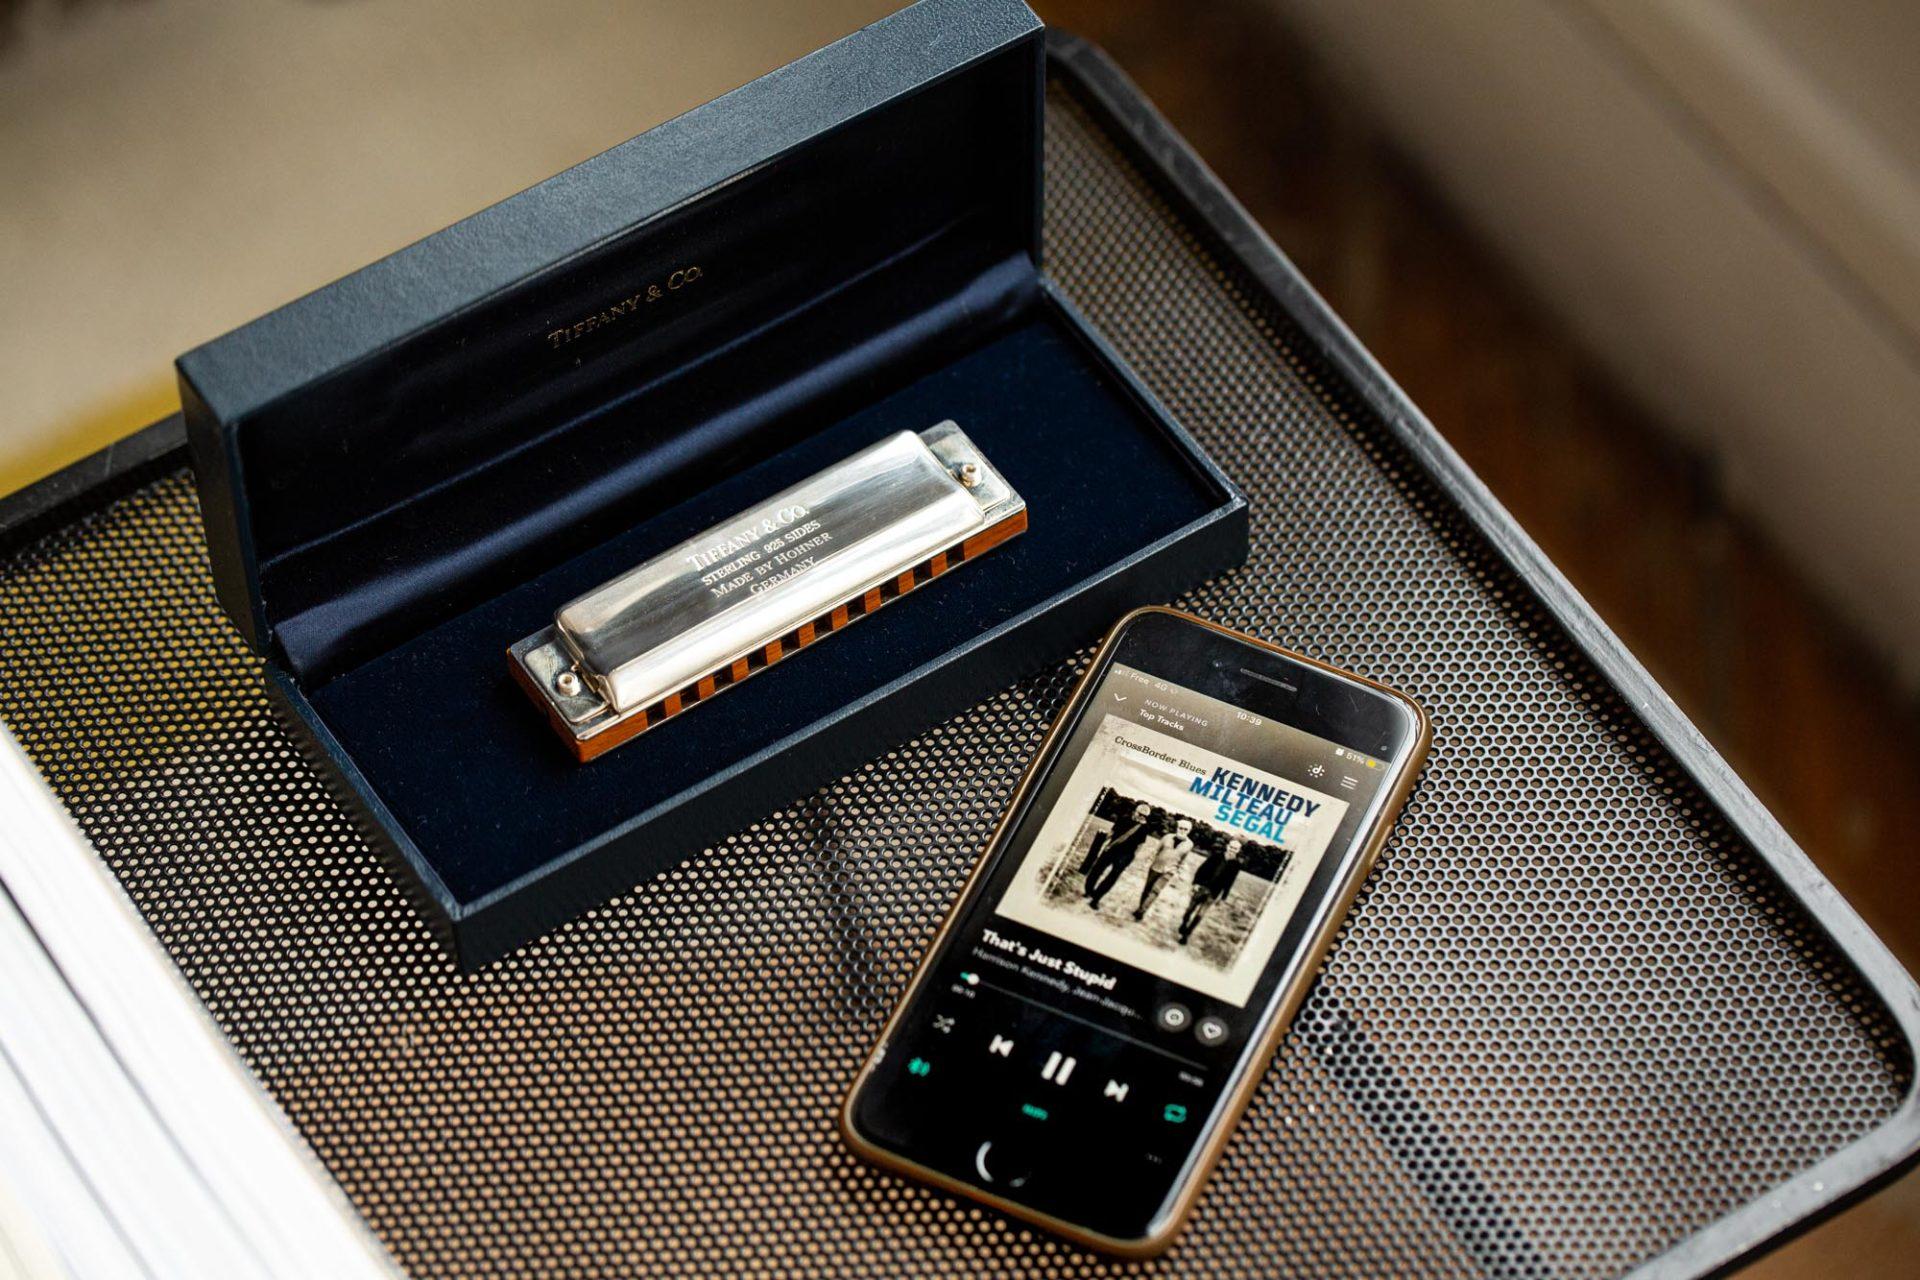 Tiffany & Co. - Harmonica - Les objets chez Joseph Bonnie